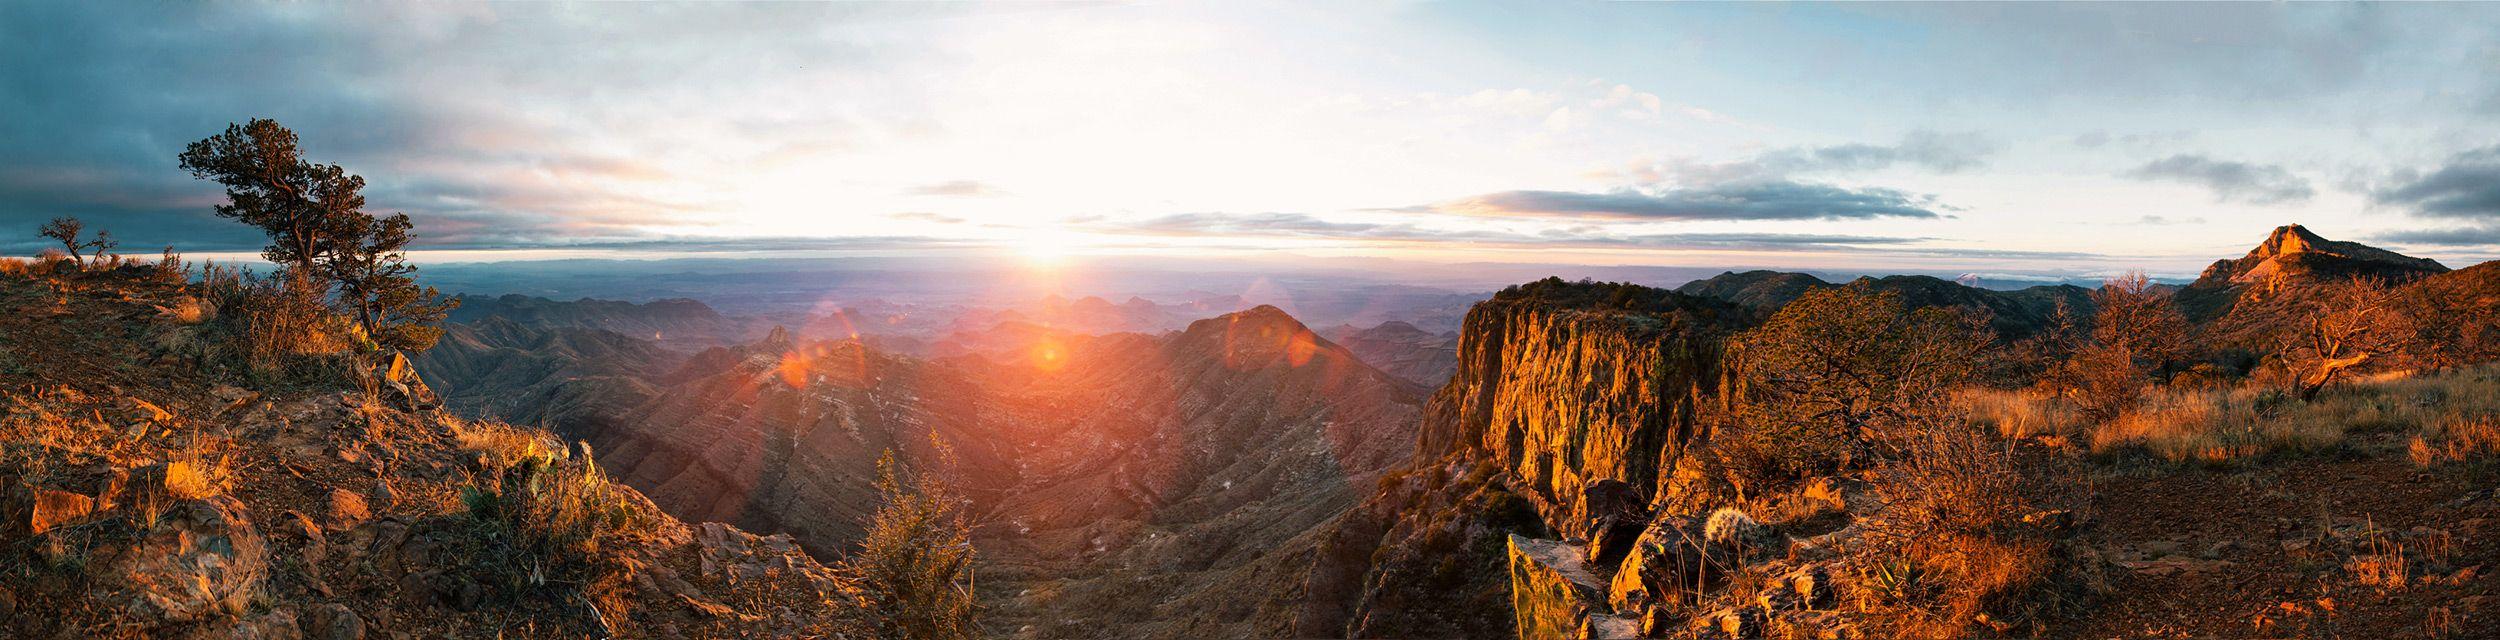 BigBend_SouthRim_Sunset (1).jpg